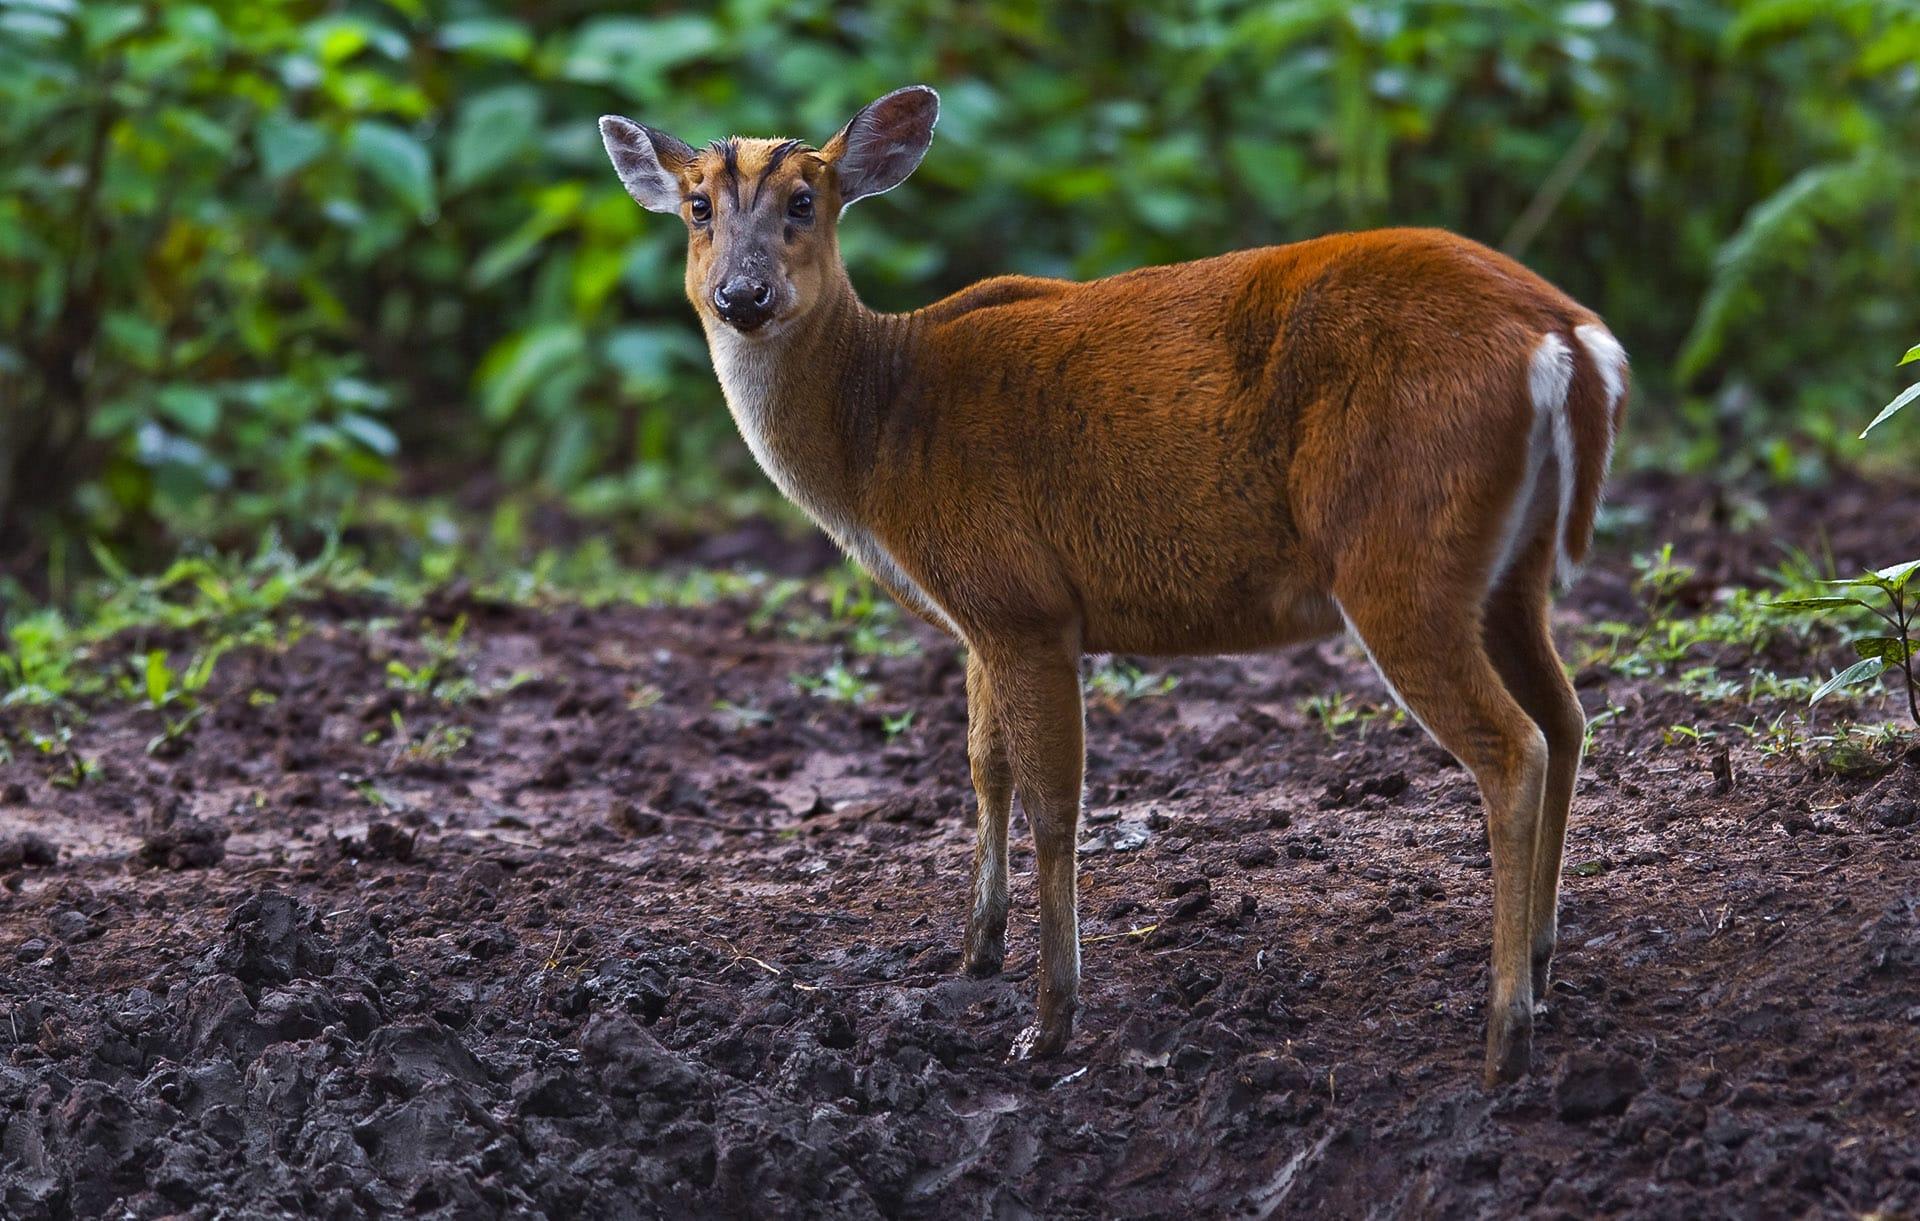 Barking Deer or Indian Muntjac: The Solitary Reaper